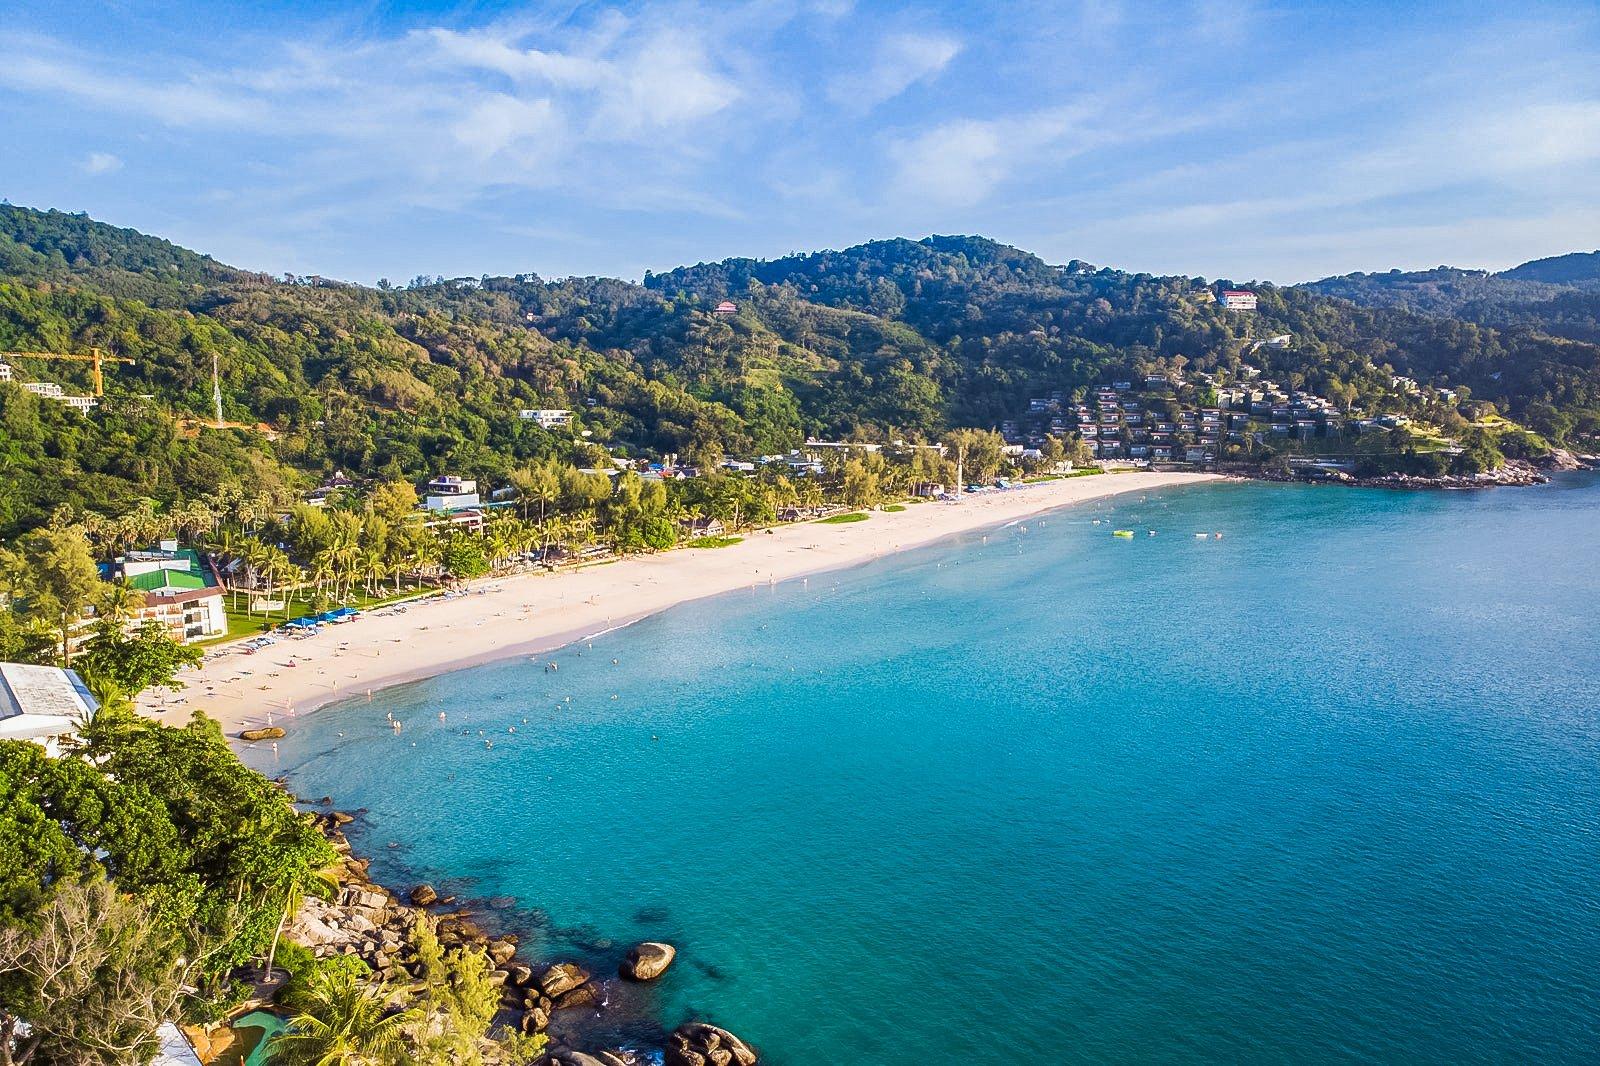 Kata Noi Beach is located on the southwest side of Phuket Island, Thailand.